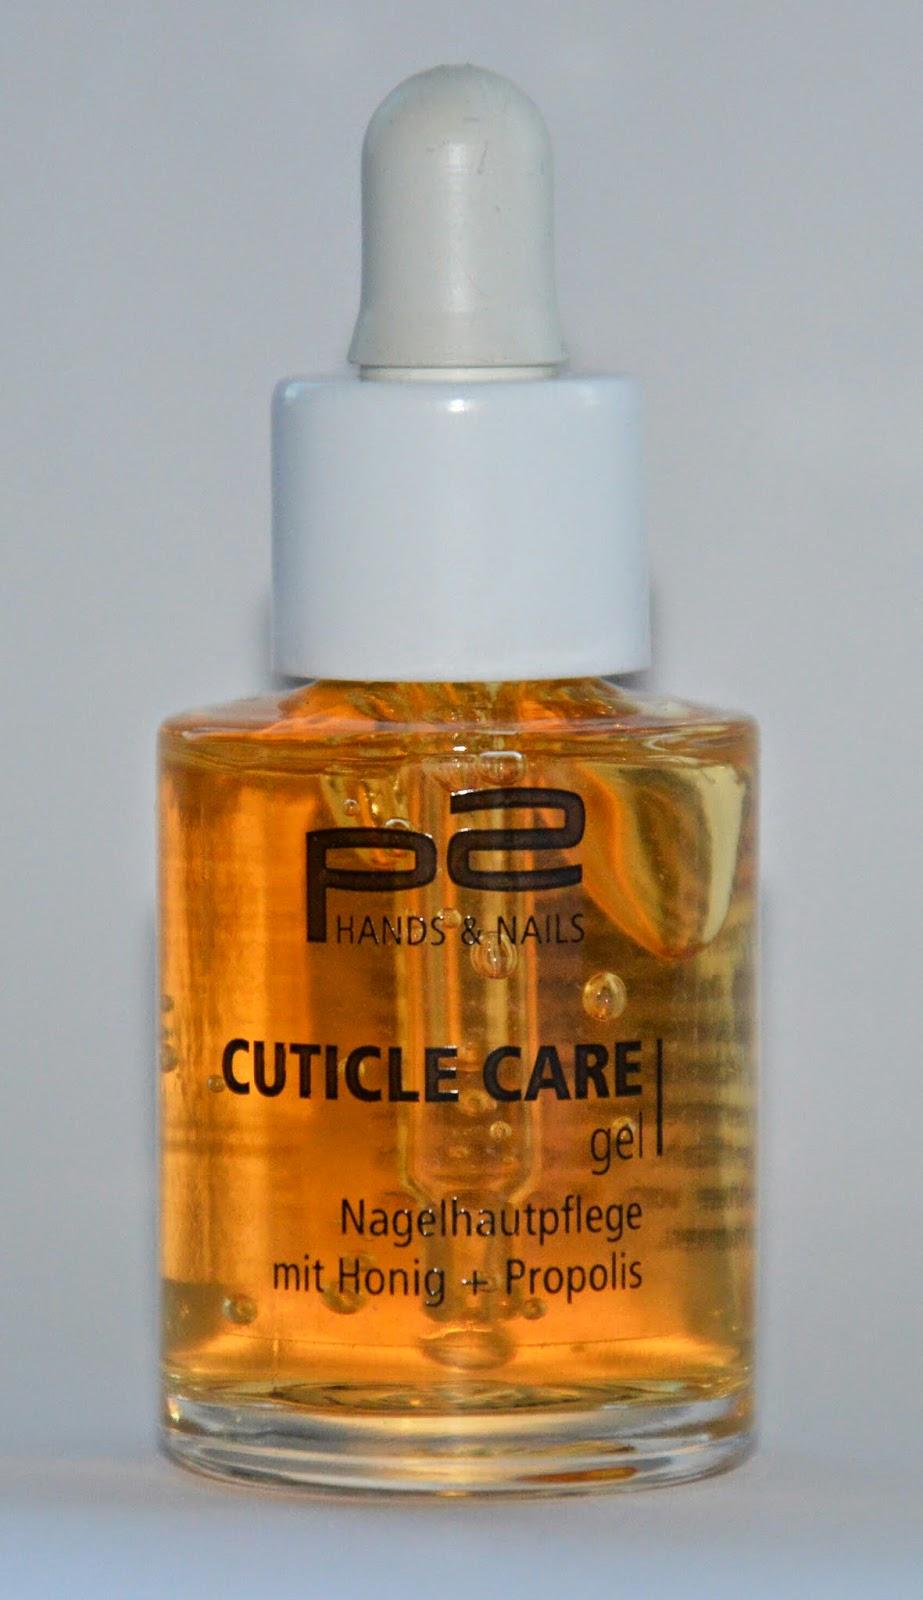 kosmetik victim p2 cuticle care gel nagelhautpflege mit. Black Bedroom Furniture Sets. Home Design Ideas